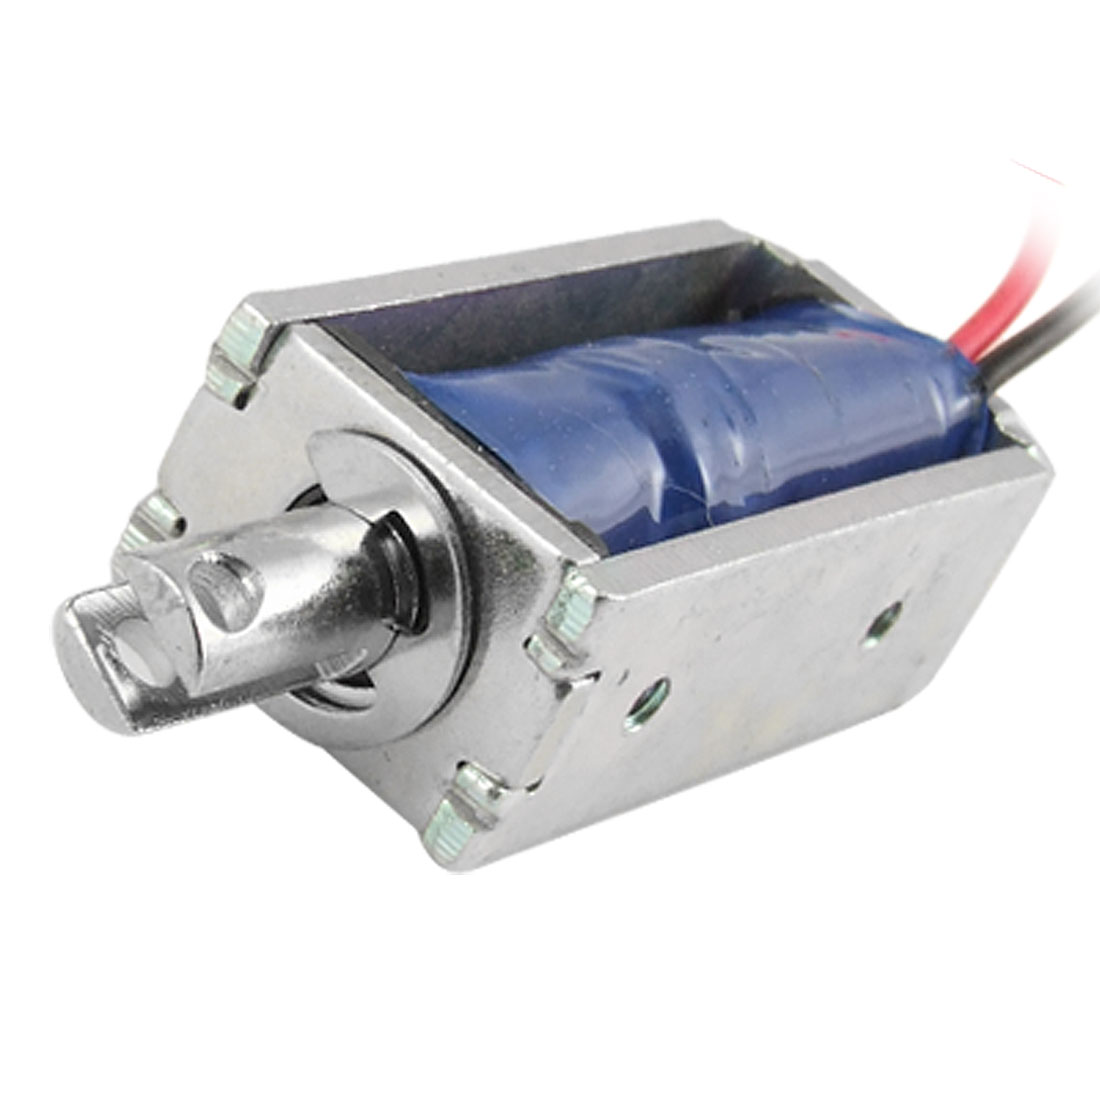 5mm Stroke Open Frame Pull Type Electromagnet Solenoid DC 12V 0.4A